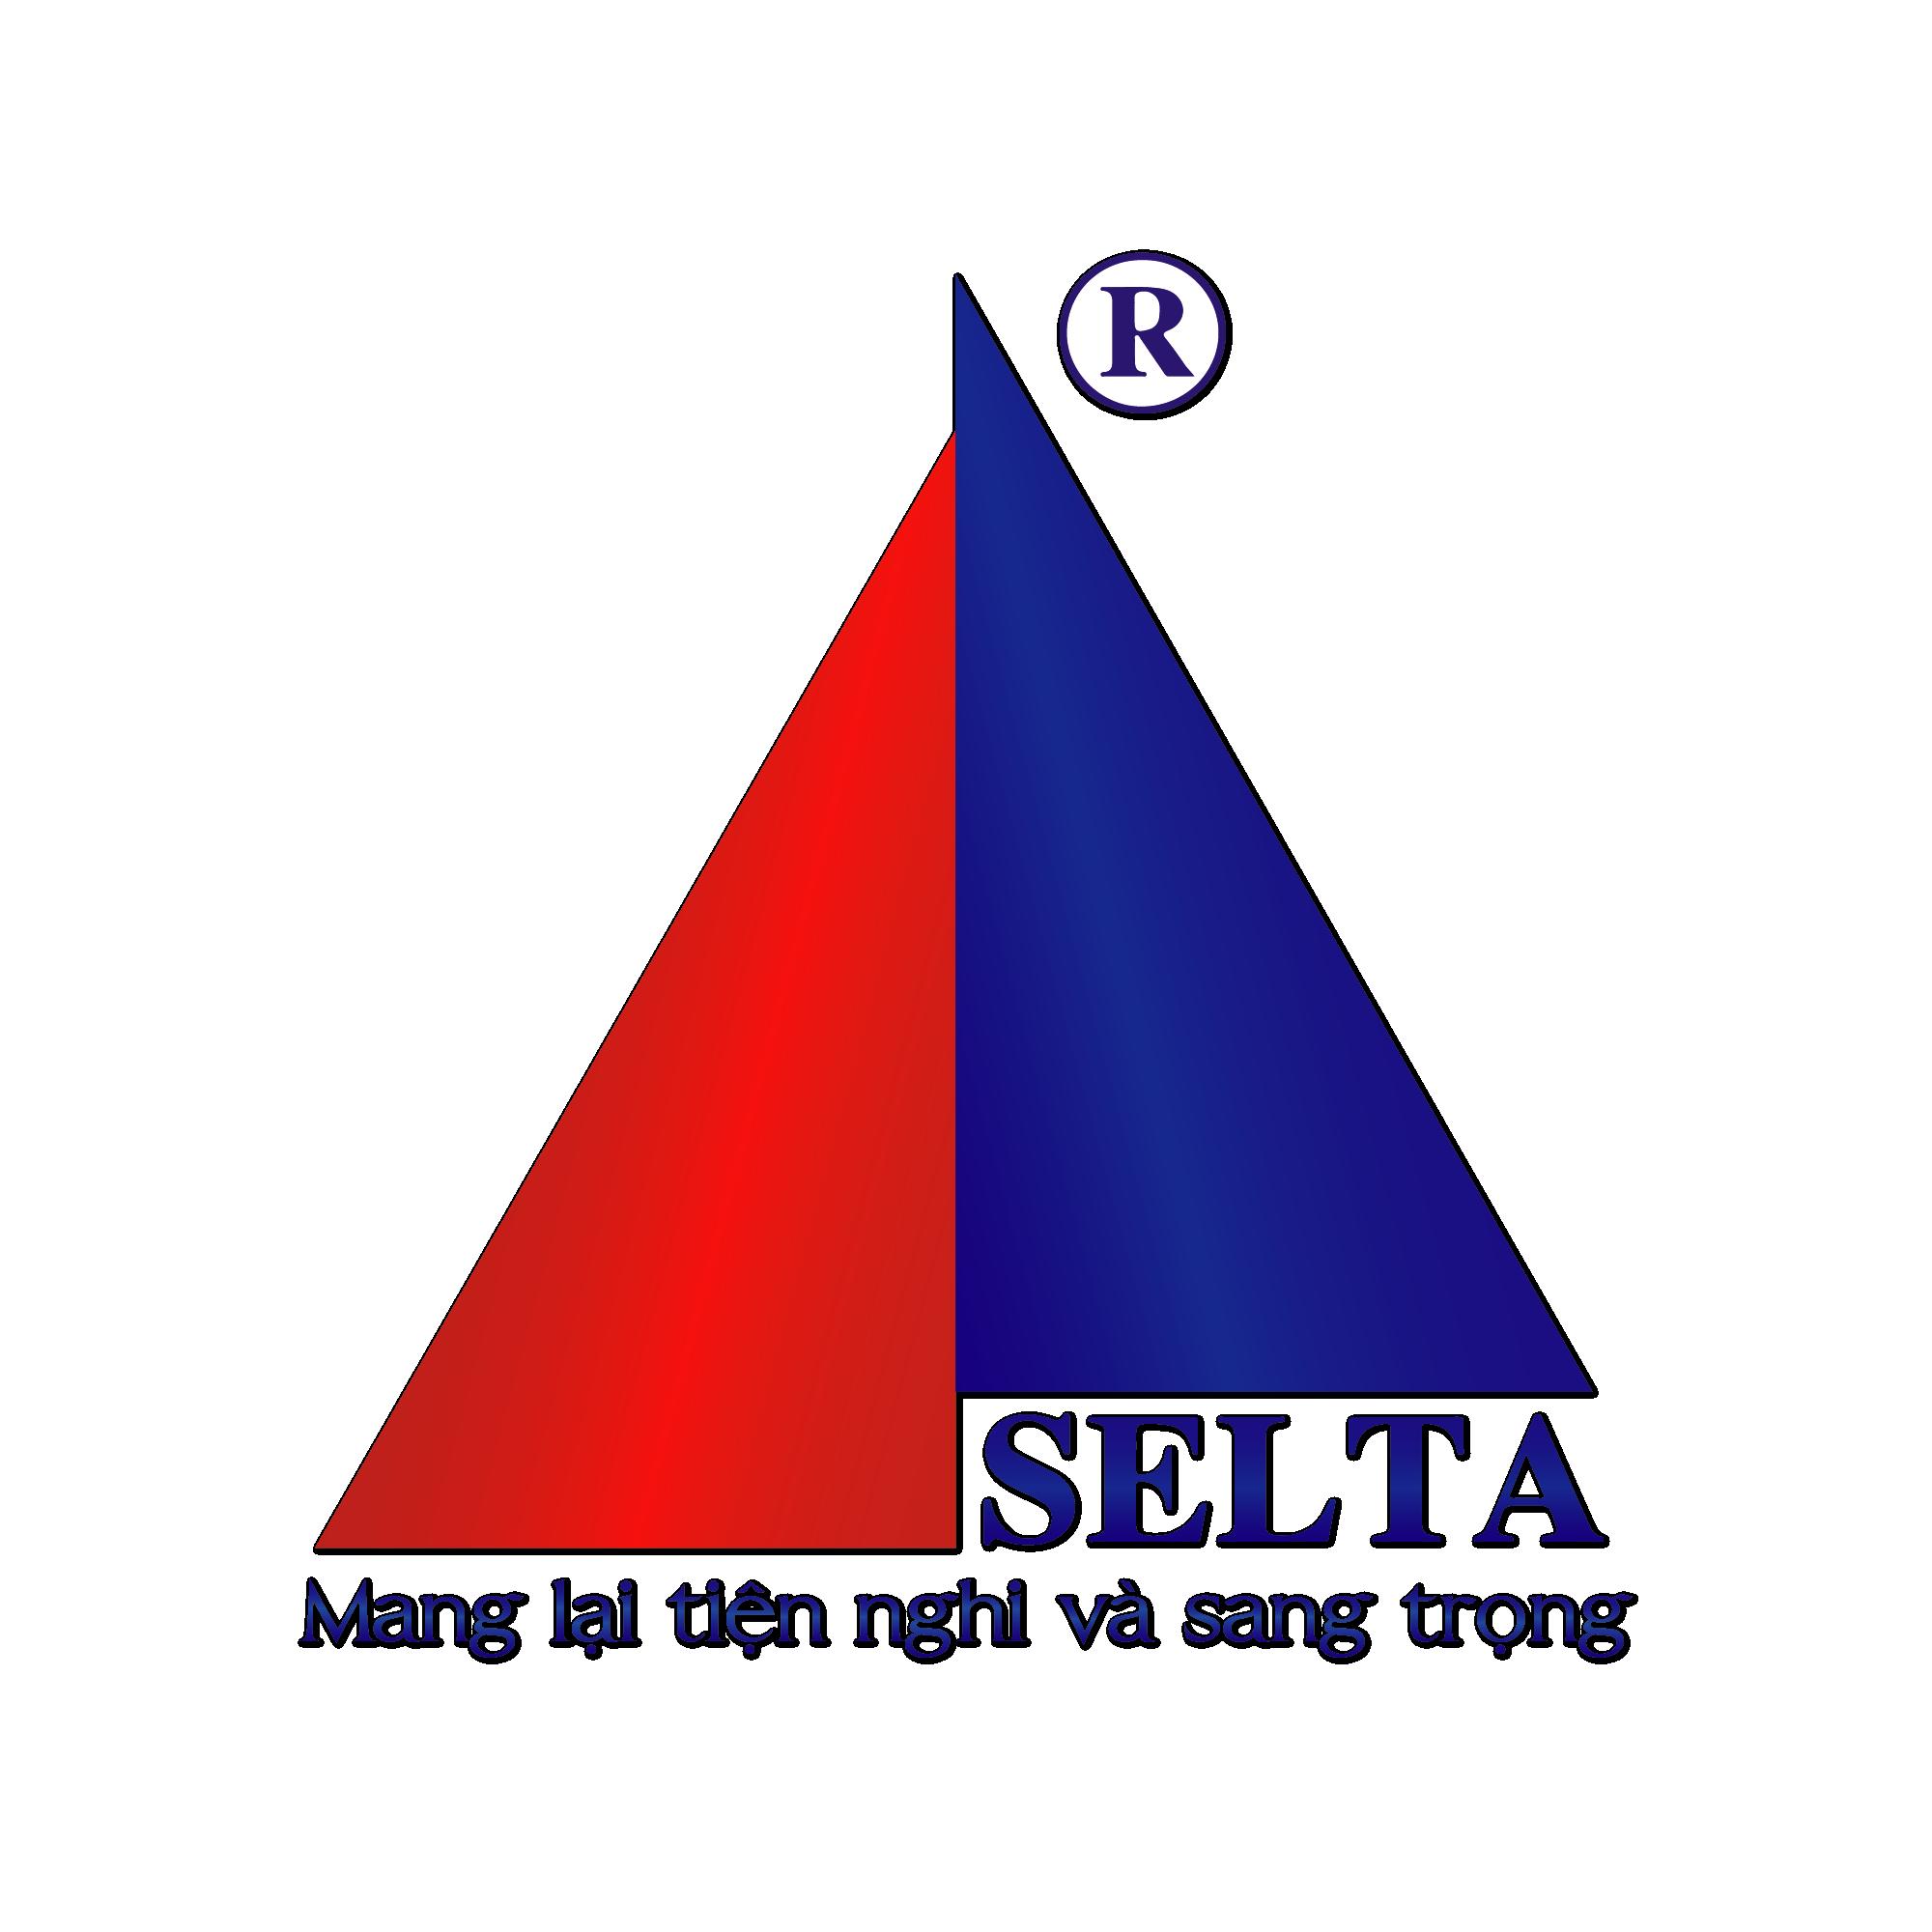 www.seltagroup.vn